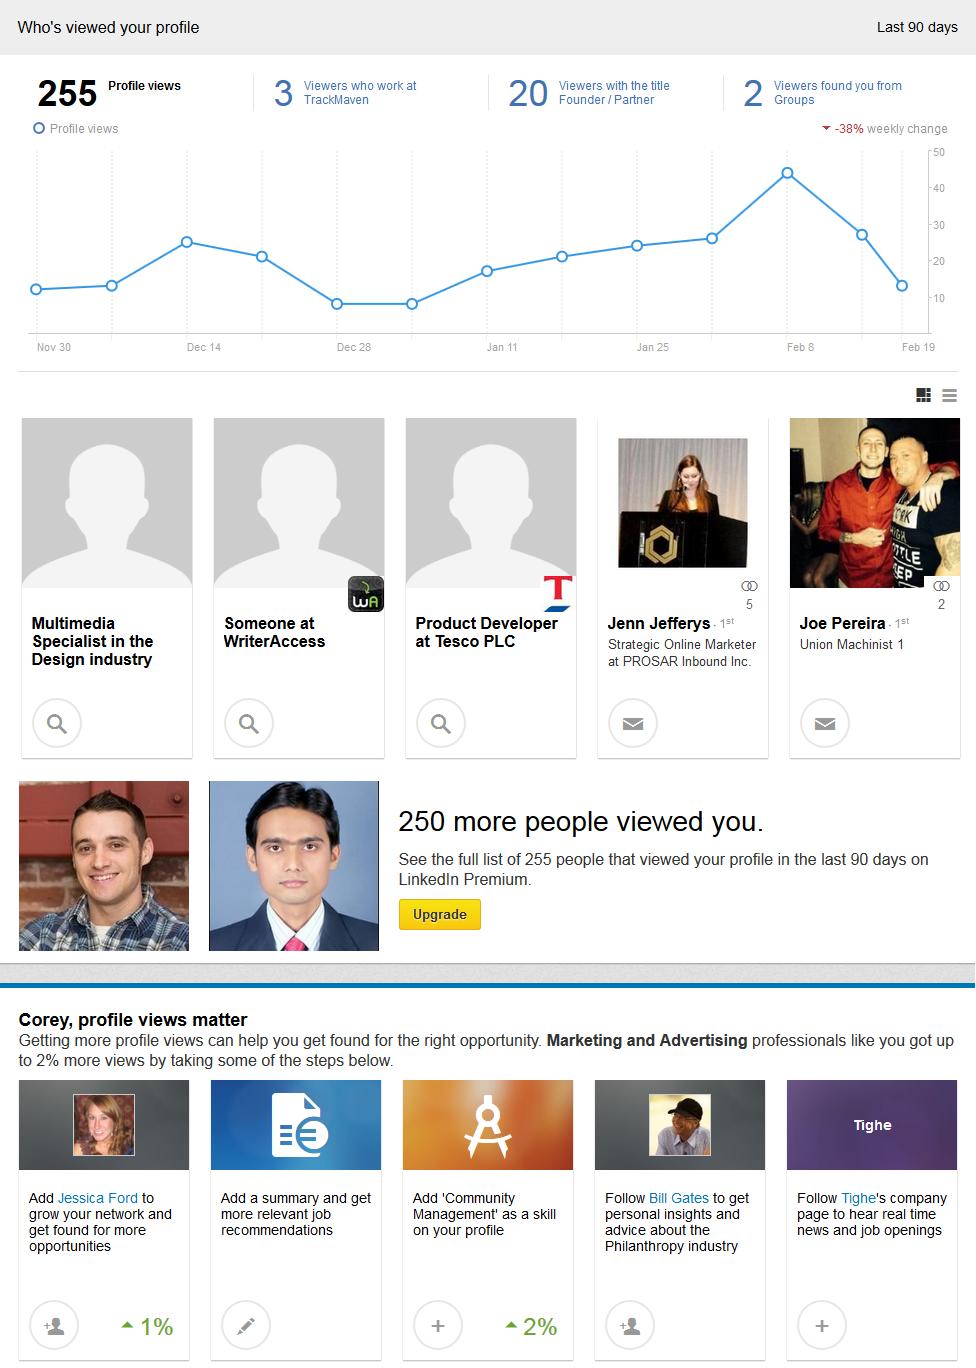 new-linkedin-profile-viewed